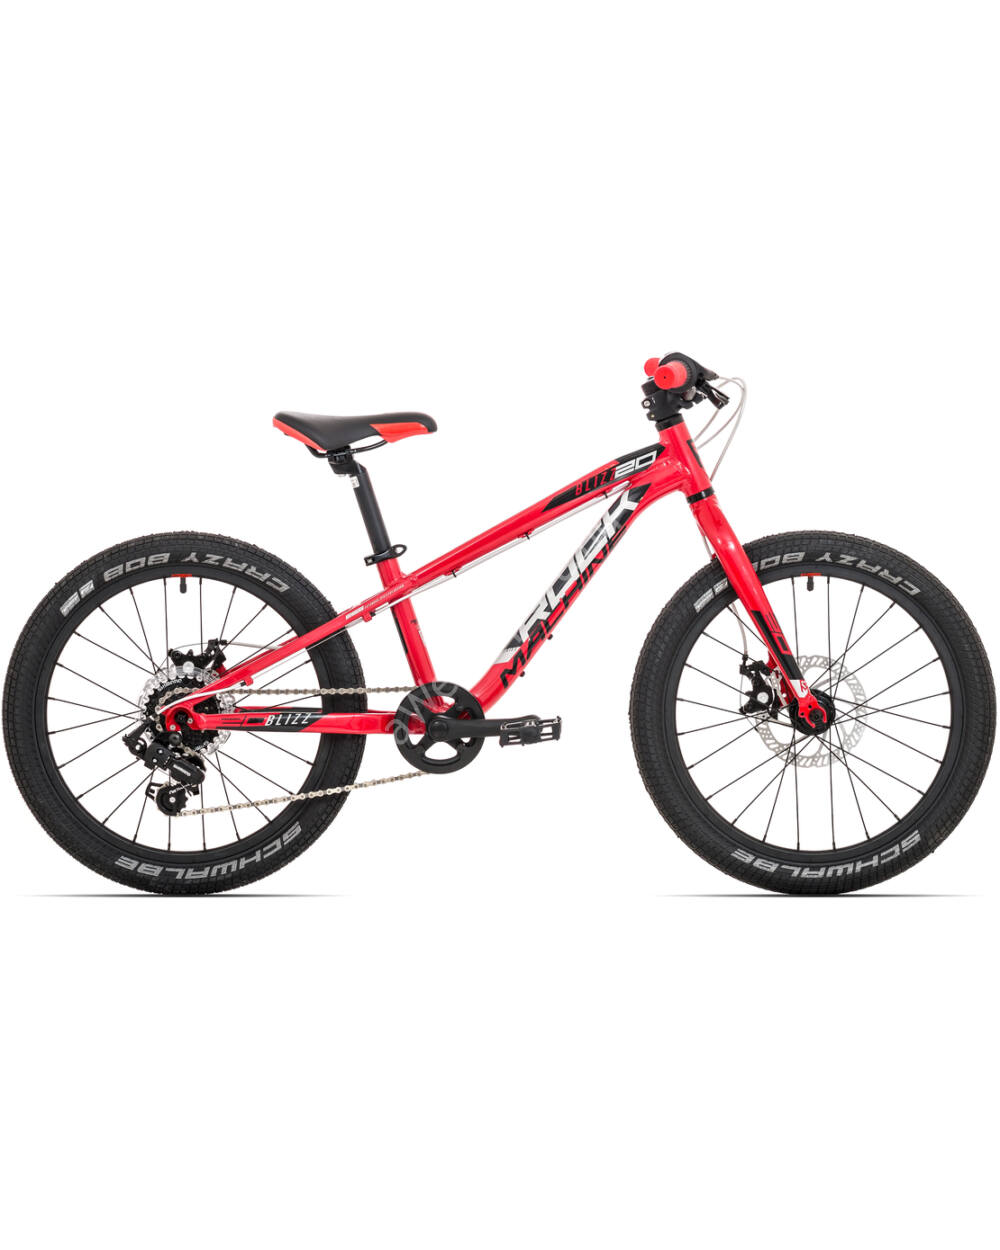 "Rock Machine Blizz 20"" ALU 7S, gloss dark red-black, 9.8kg, 110 cm-től"